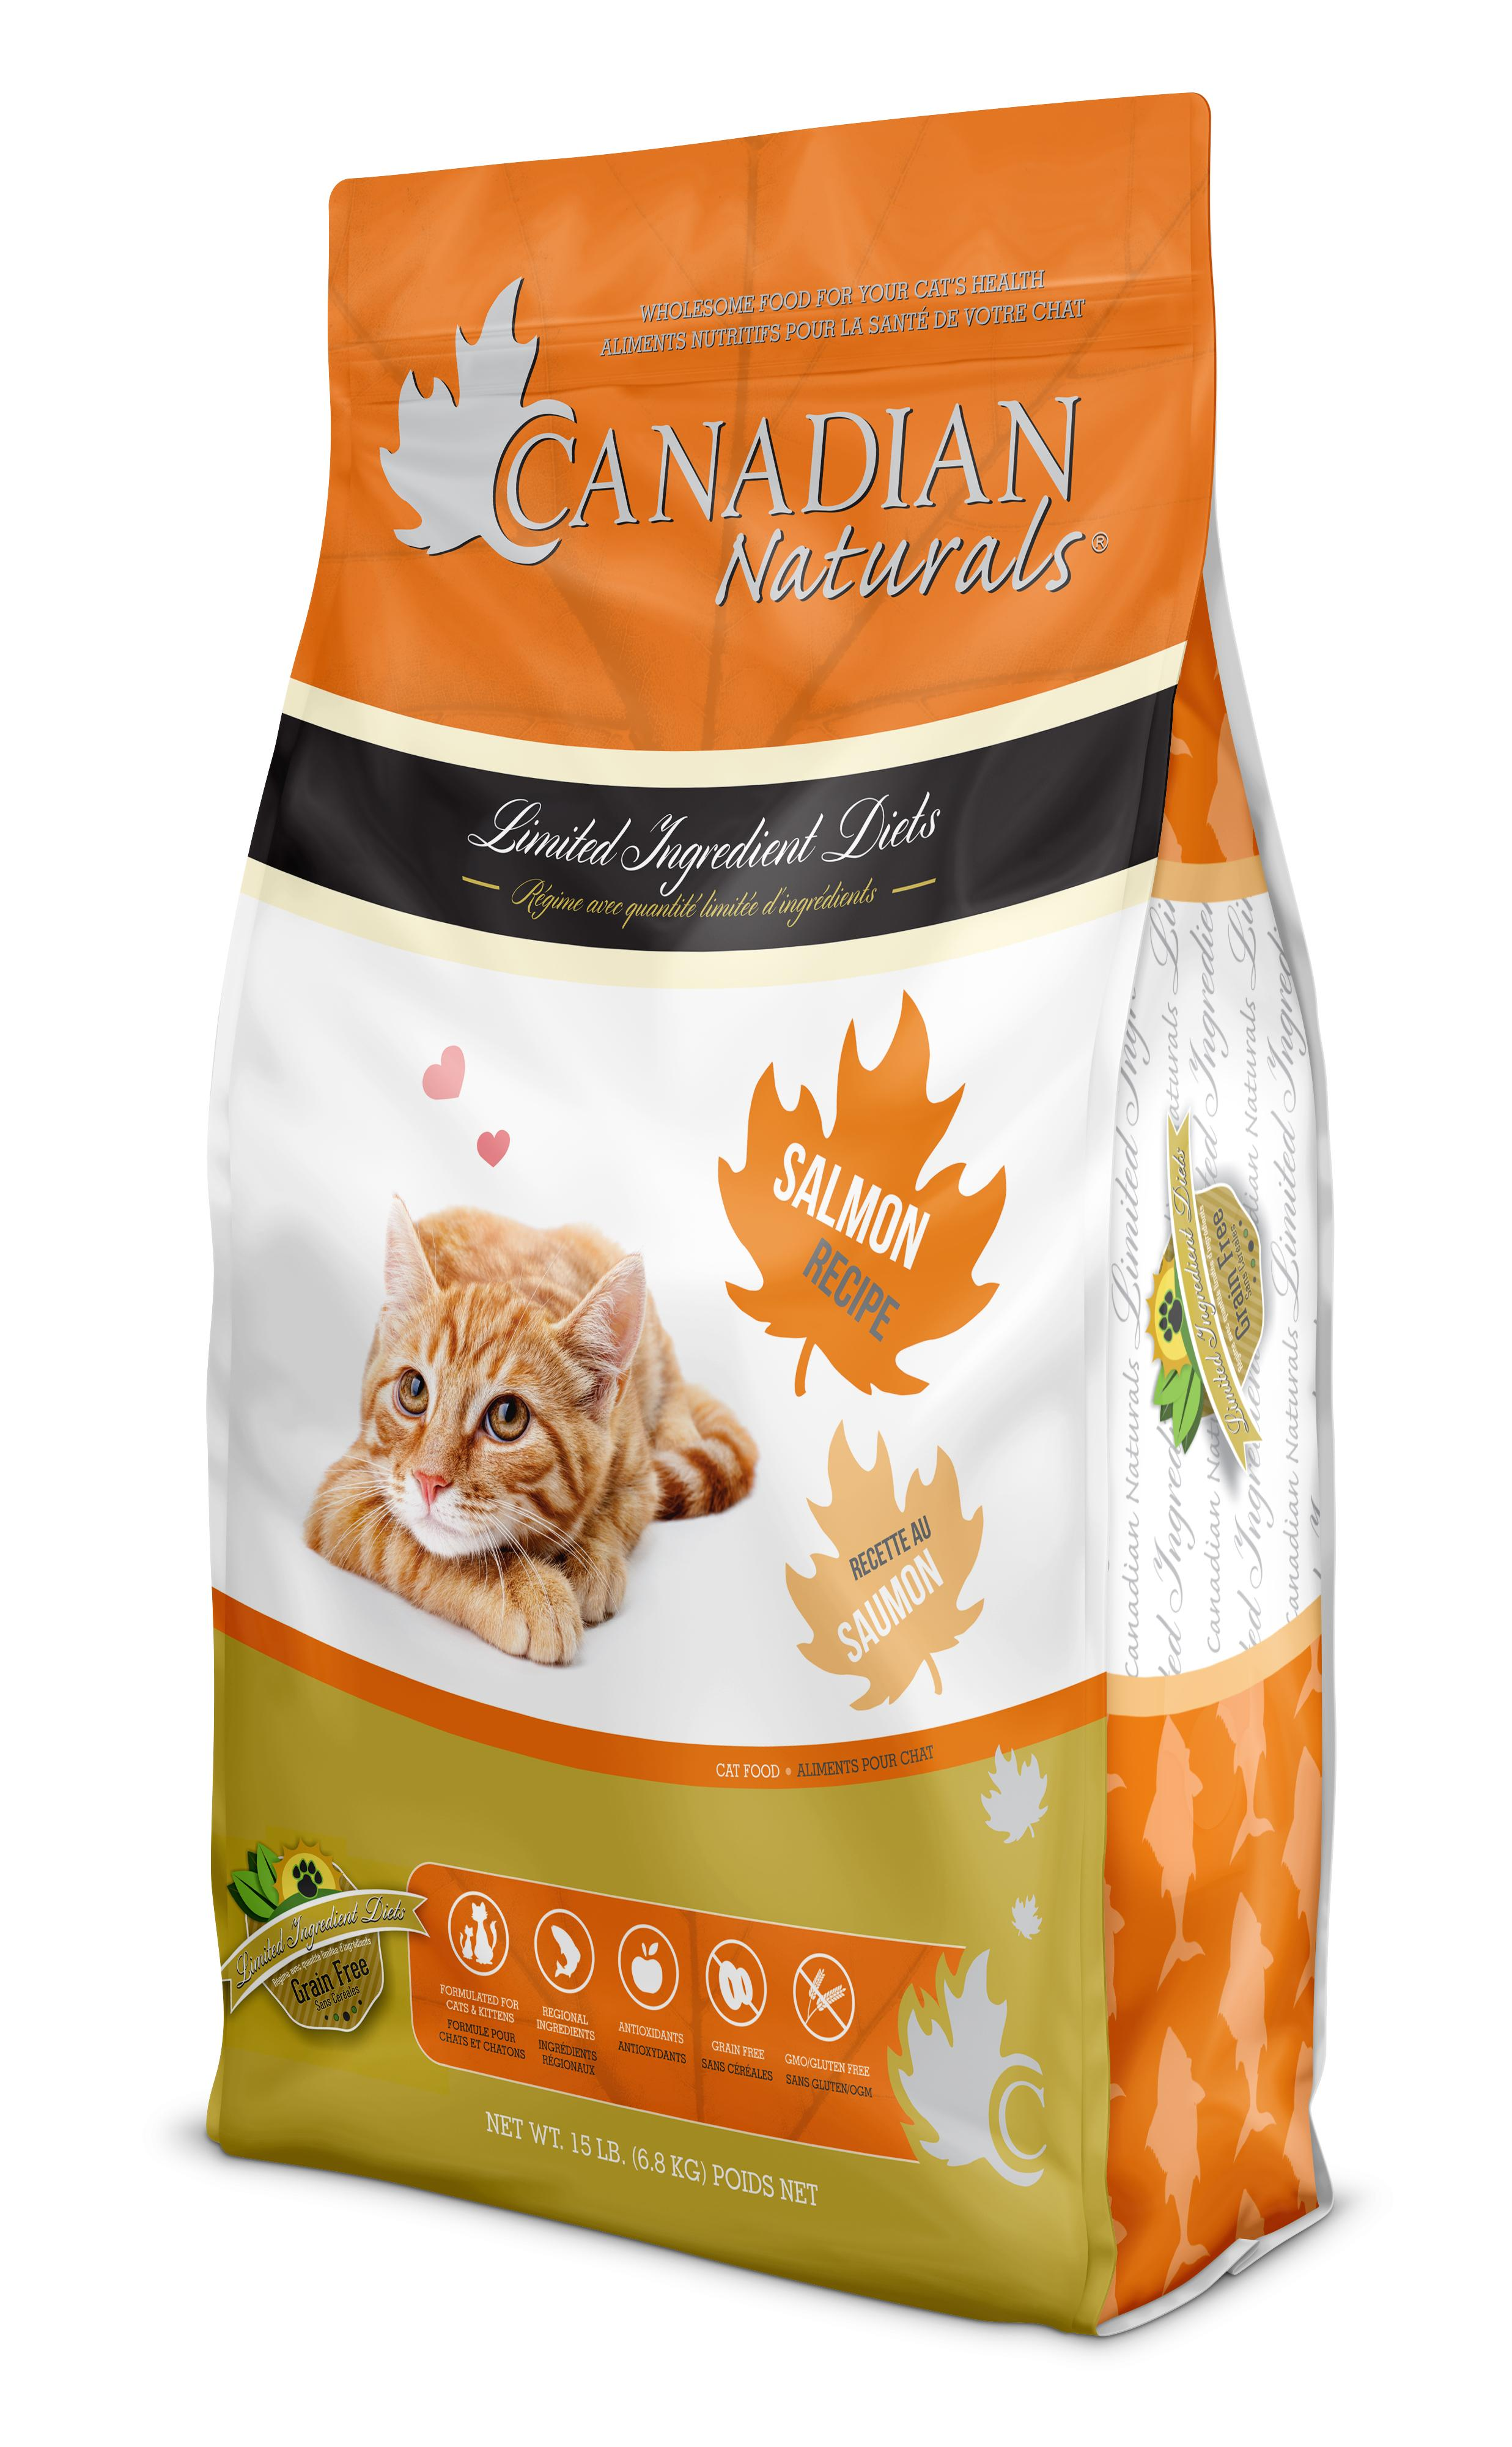 Canadian Naturals LID Salmon Grain-Free Dry Cat Food Image